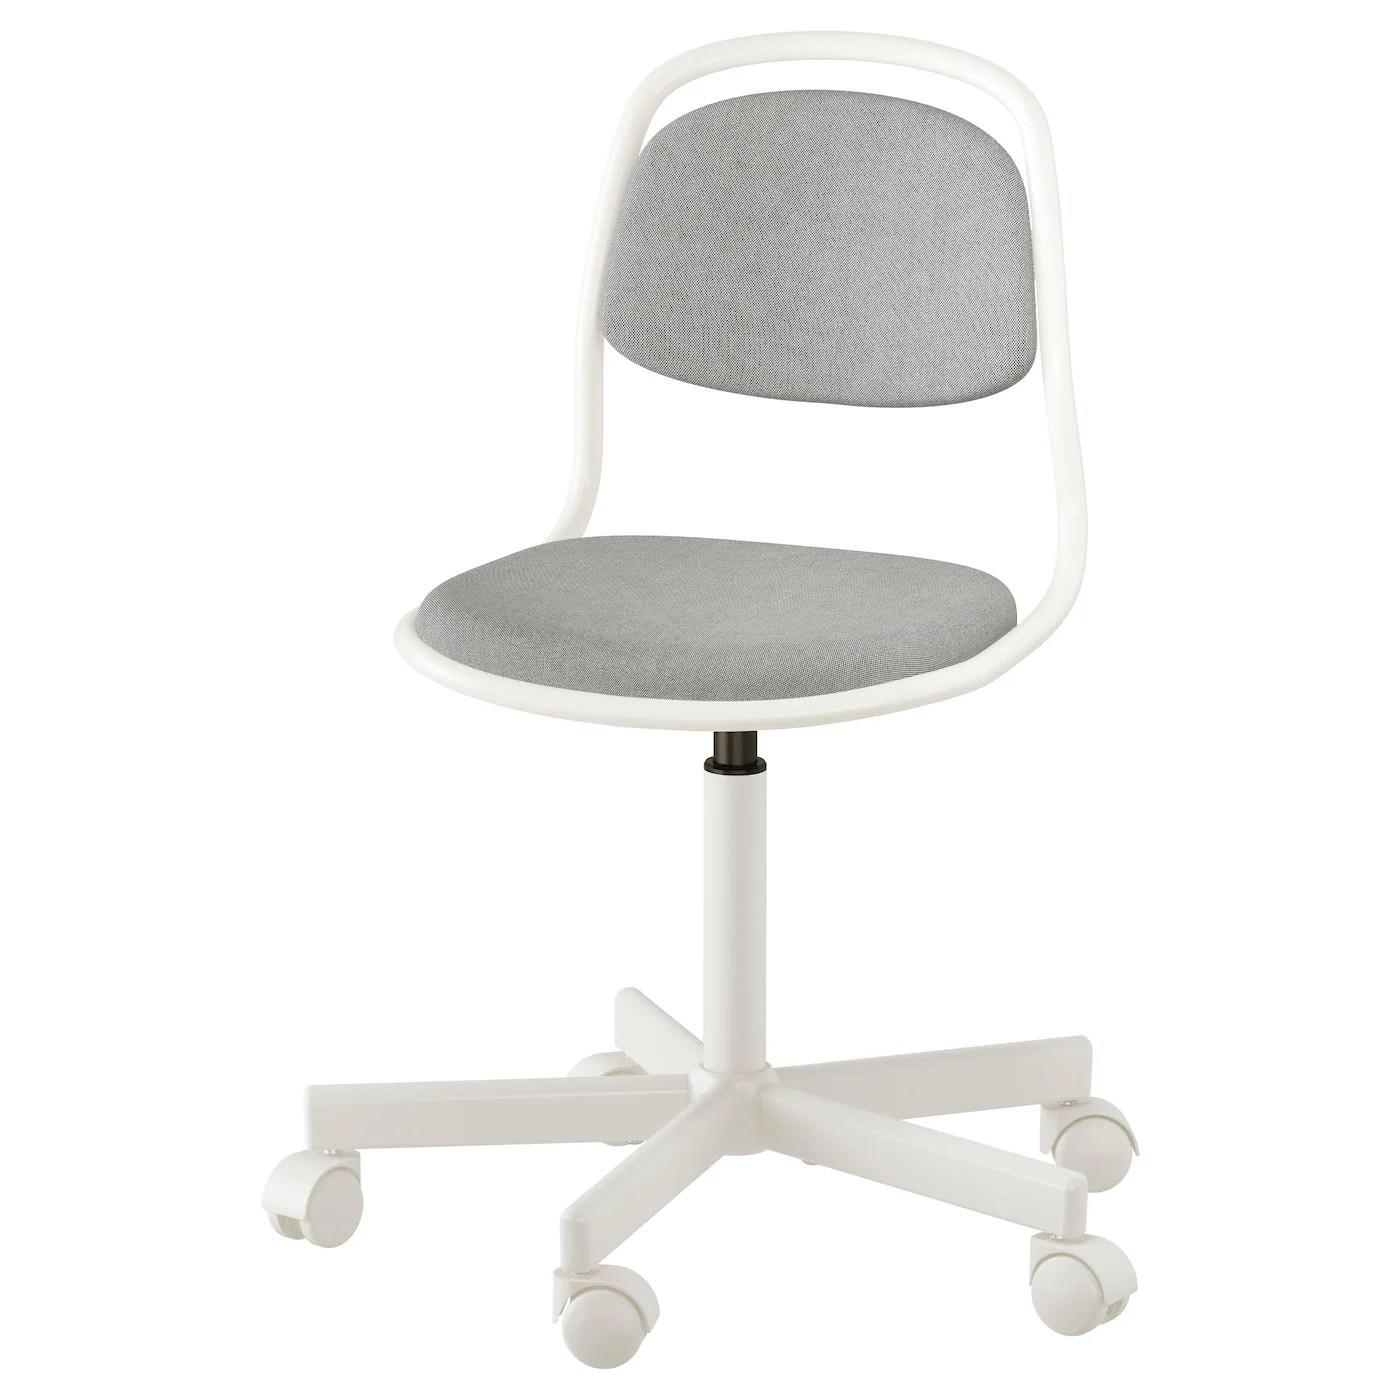 white ikea office chair covers northern ireland ÖrfjÄll children 39s desk vissle light grey